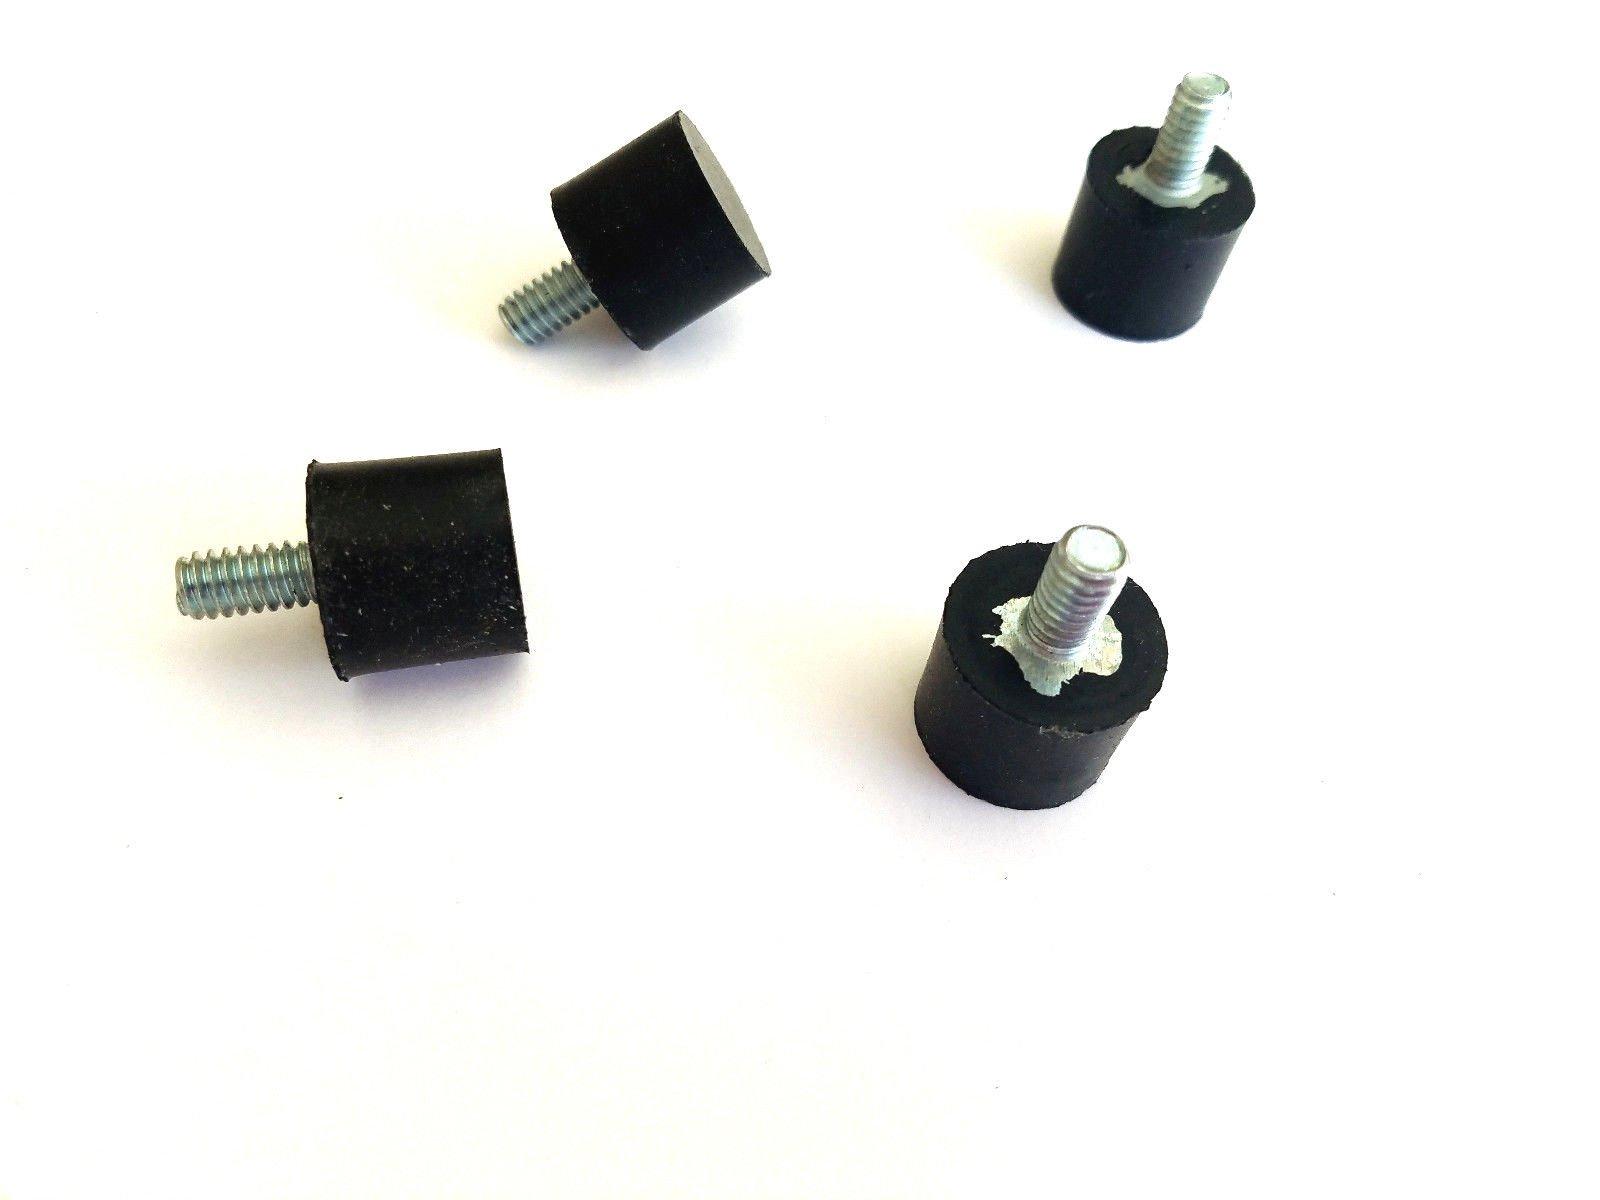 Lot of (4) Rubber Anti - Vibration Isolator Mounts Rubber Height 5/8'' x 3/4'' Rubber Diameter - Stud 1/4-20 x 1/2'' Length